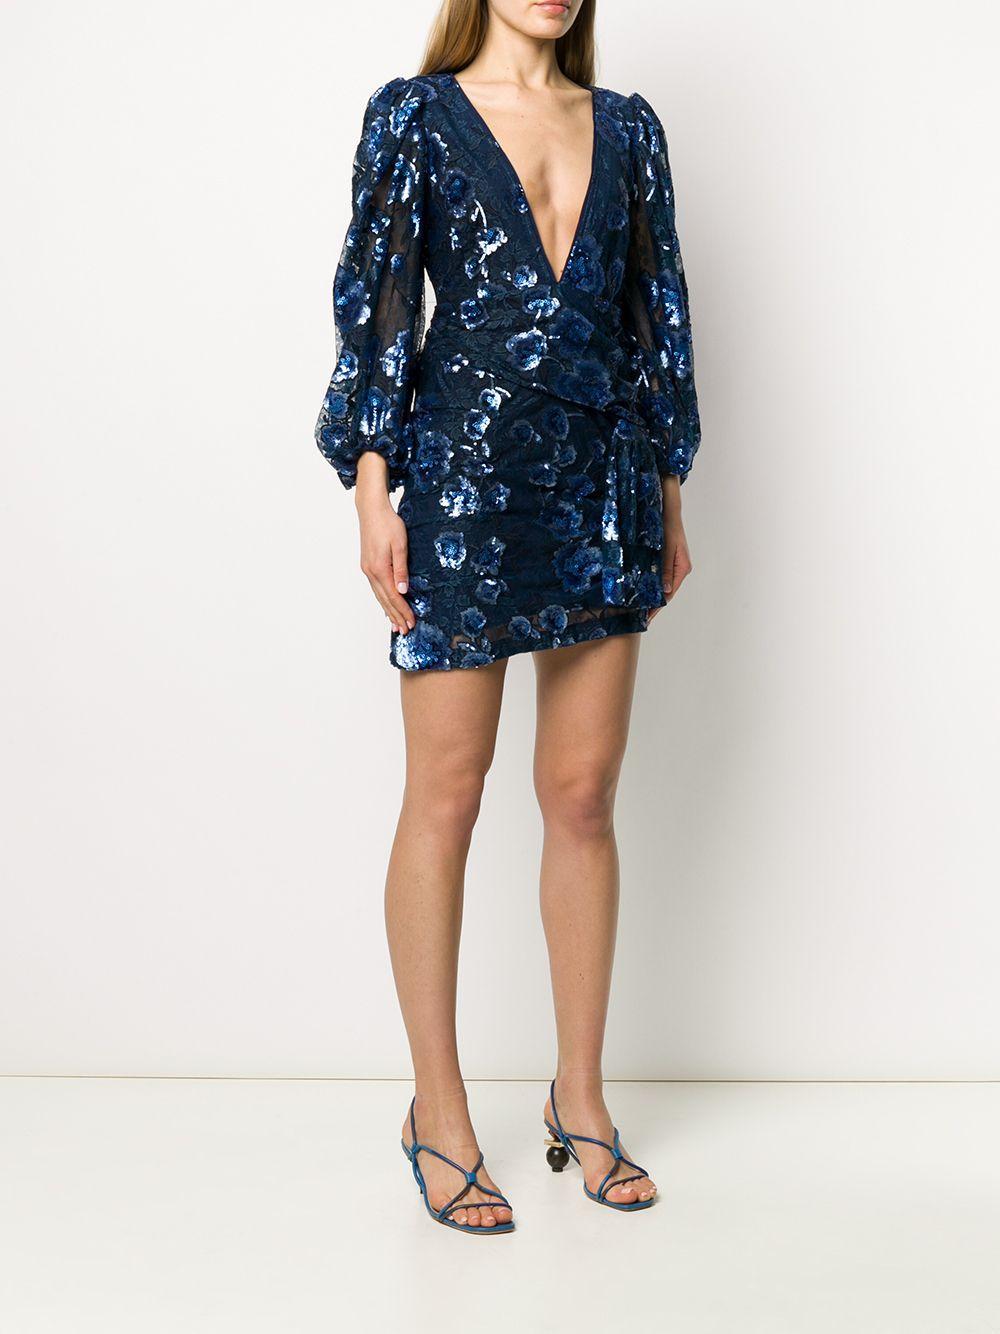 Vestido corto con bordado floral For Love & Lemons de Encaje de color Azul